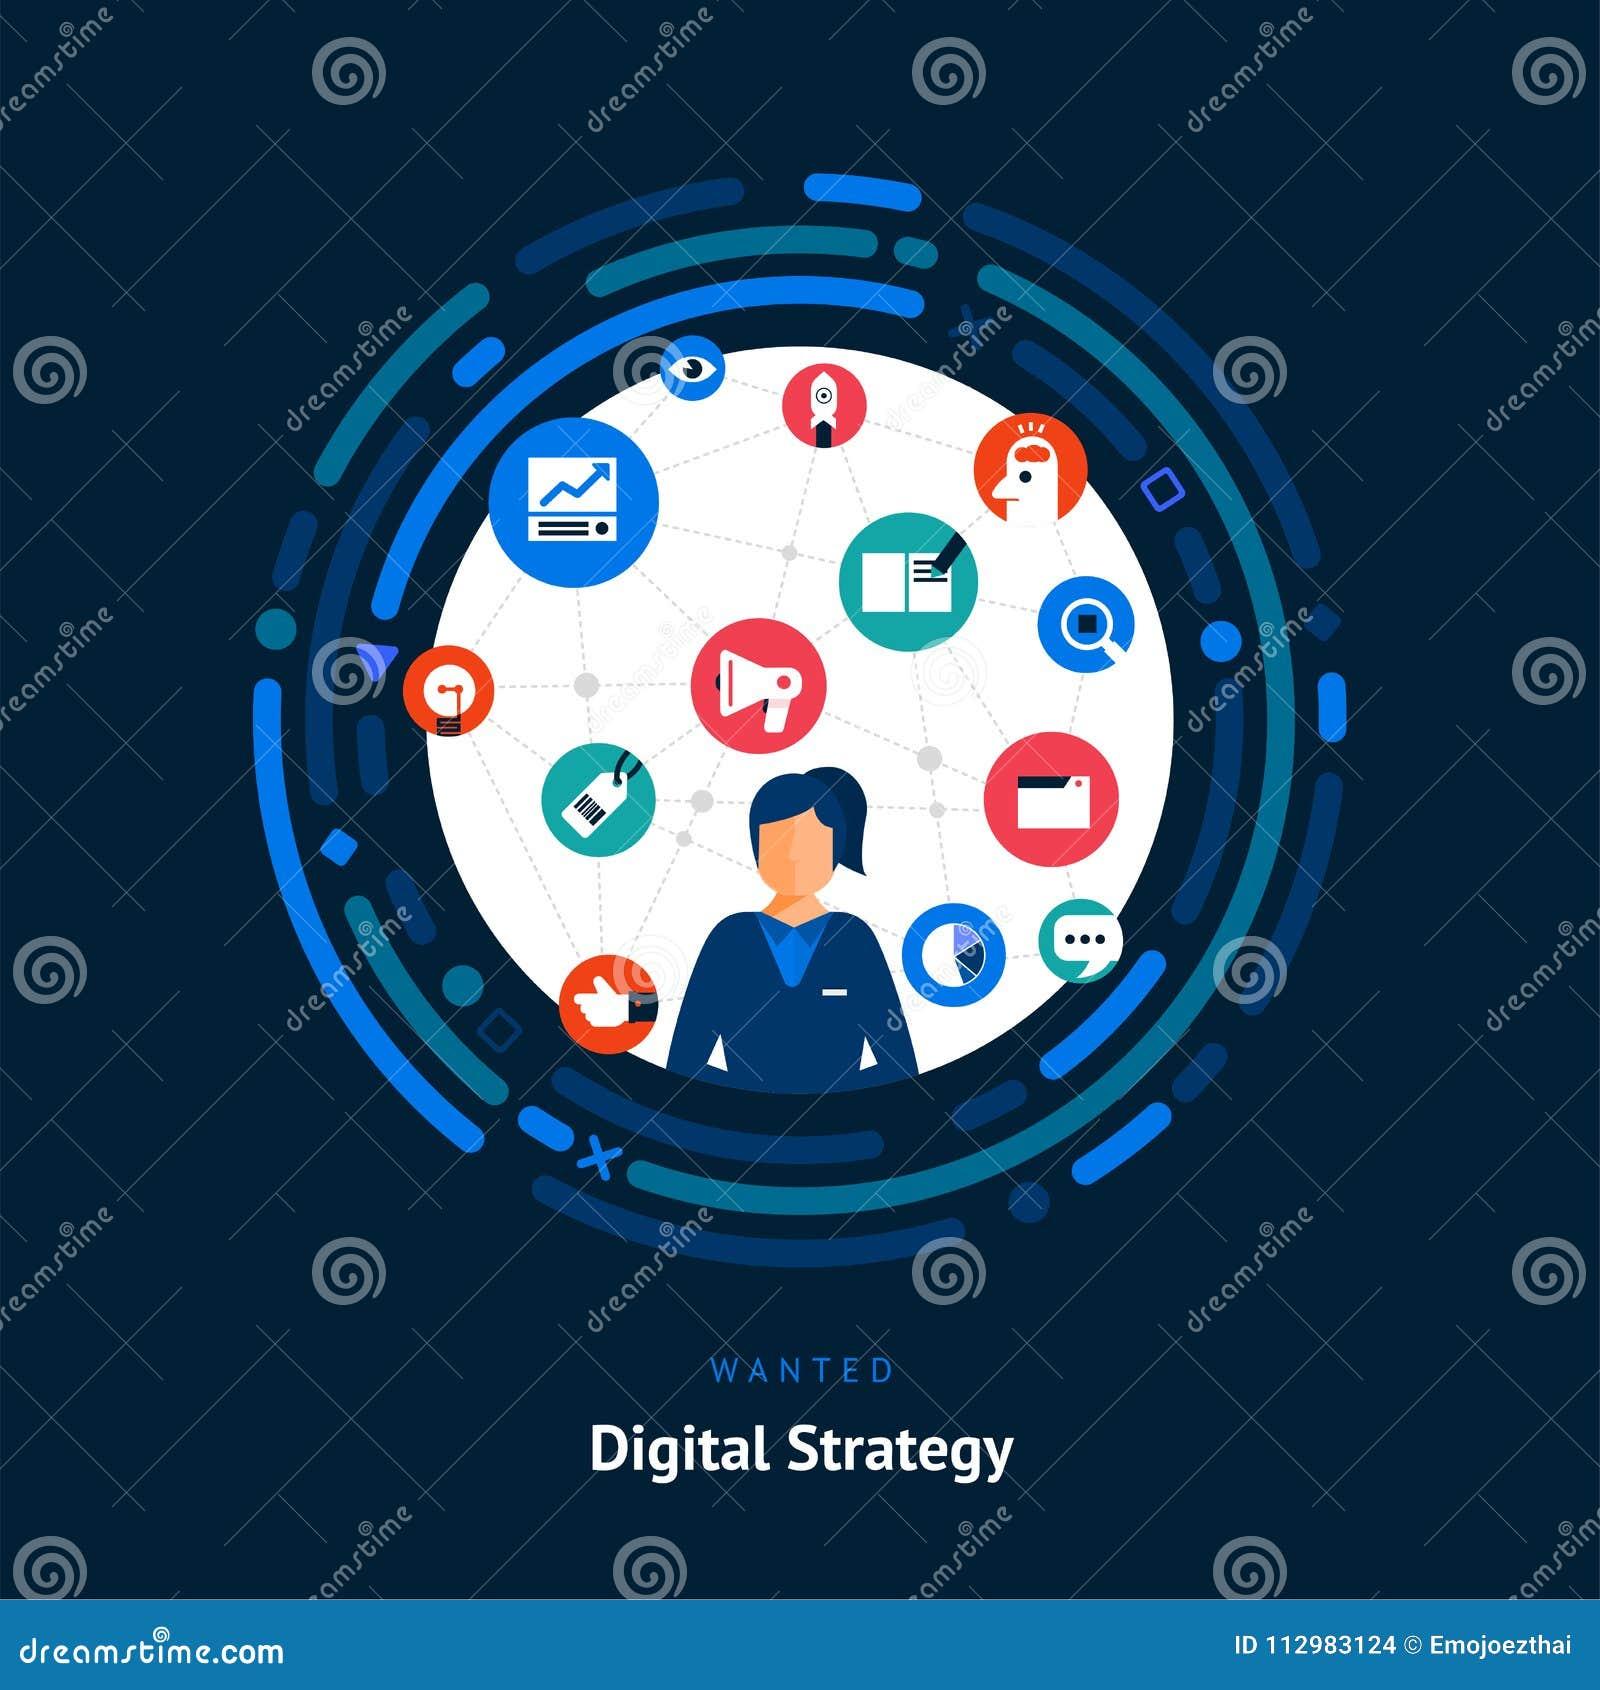 Digital_Strategist